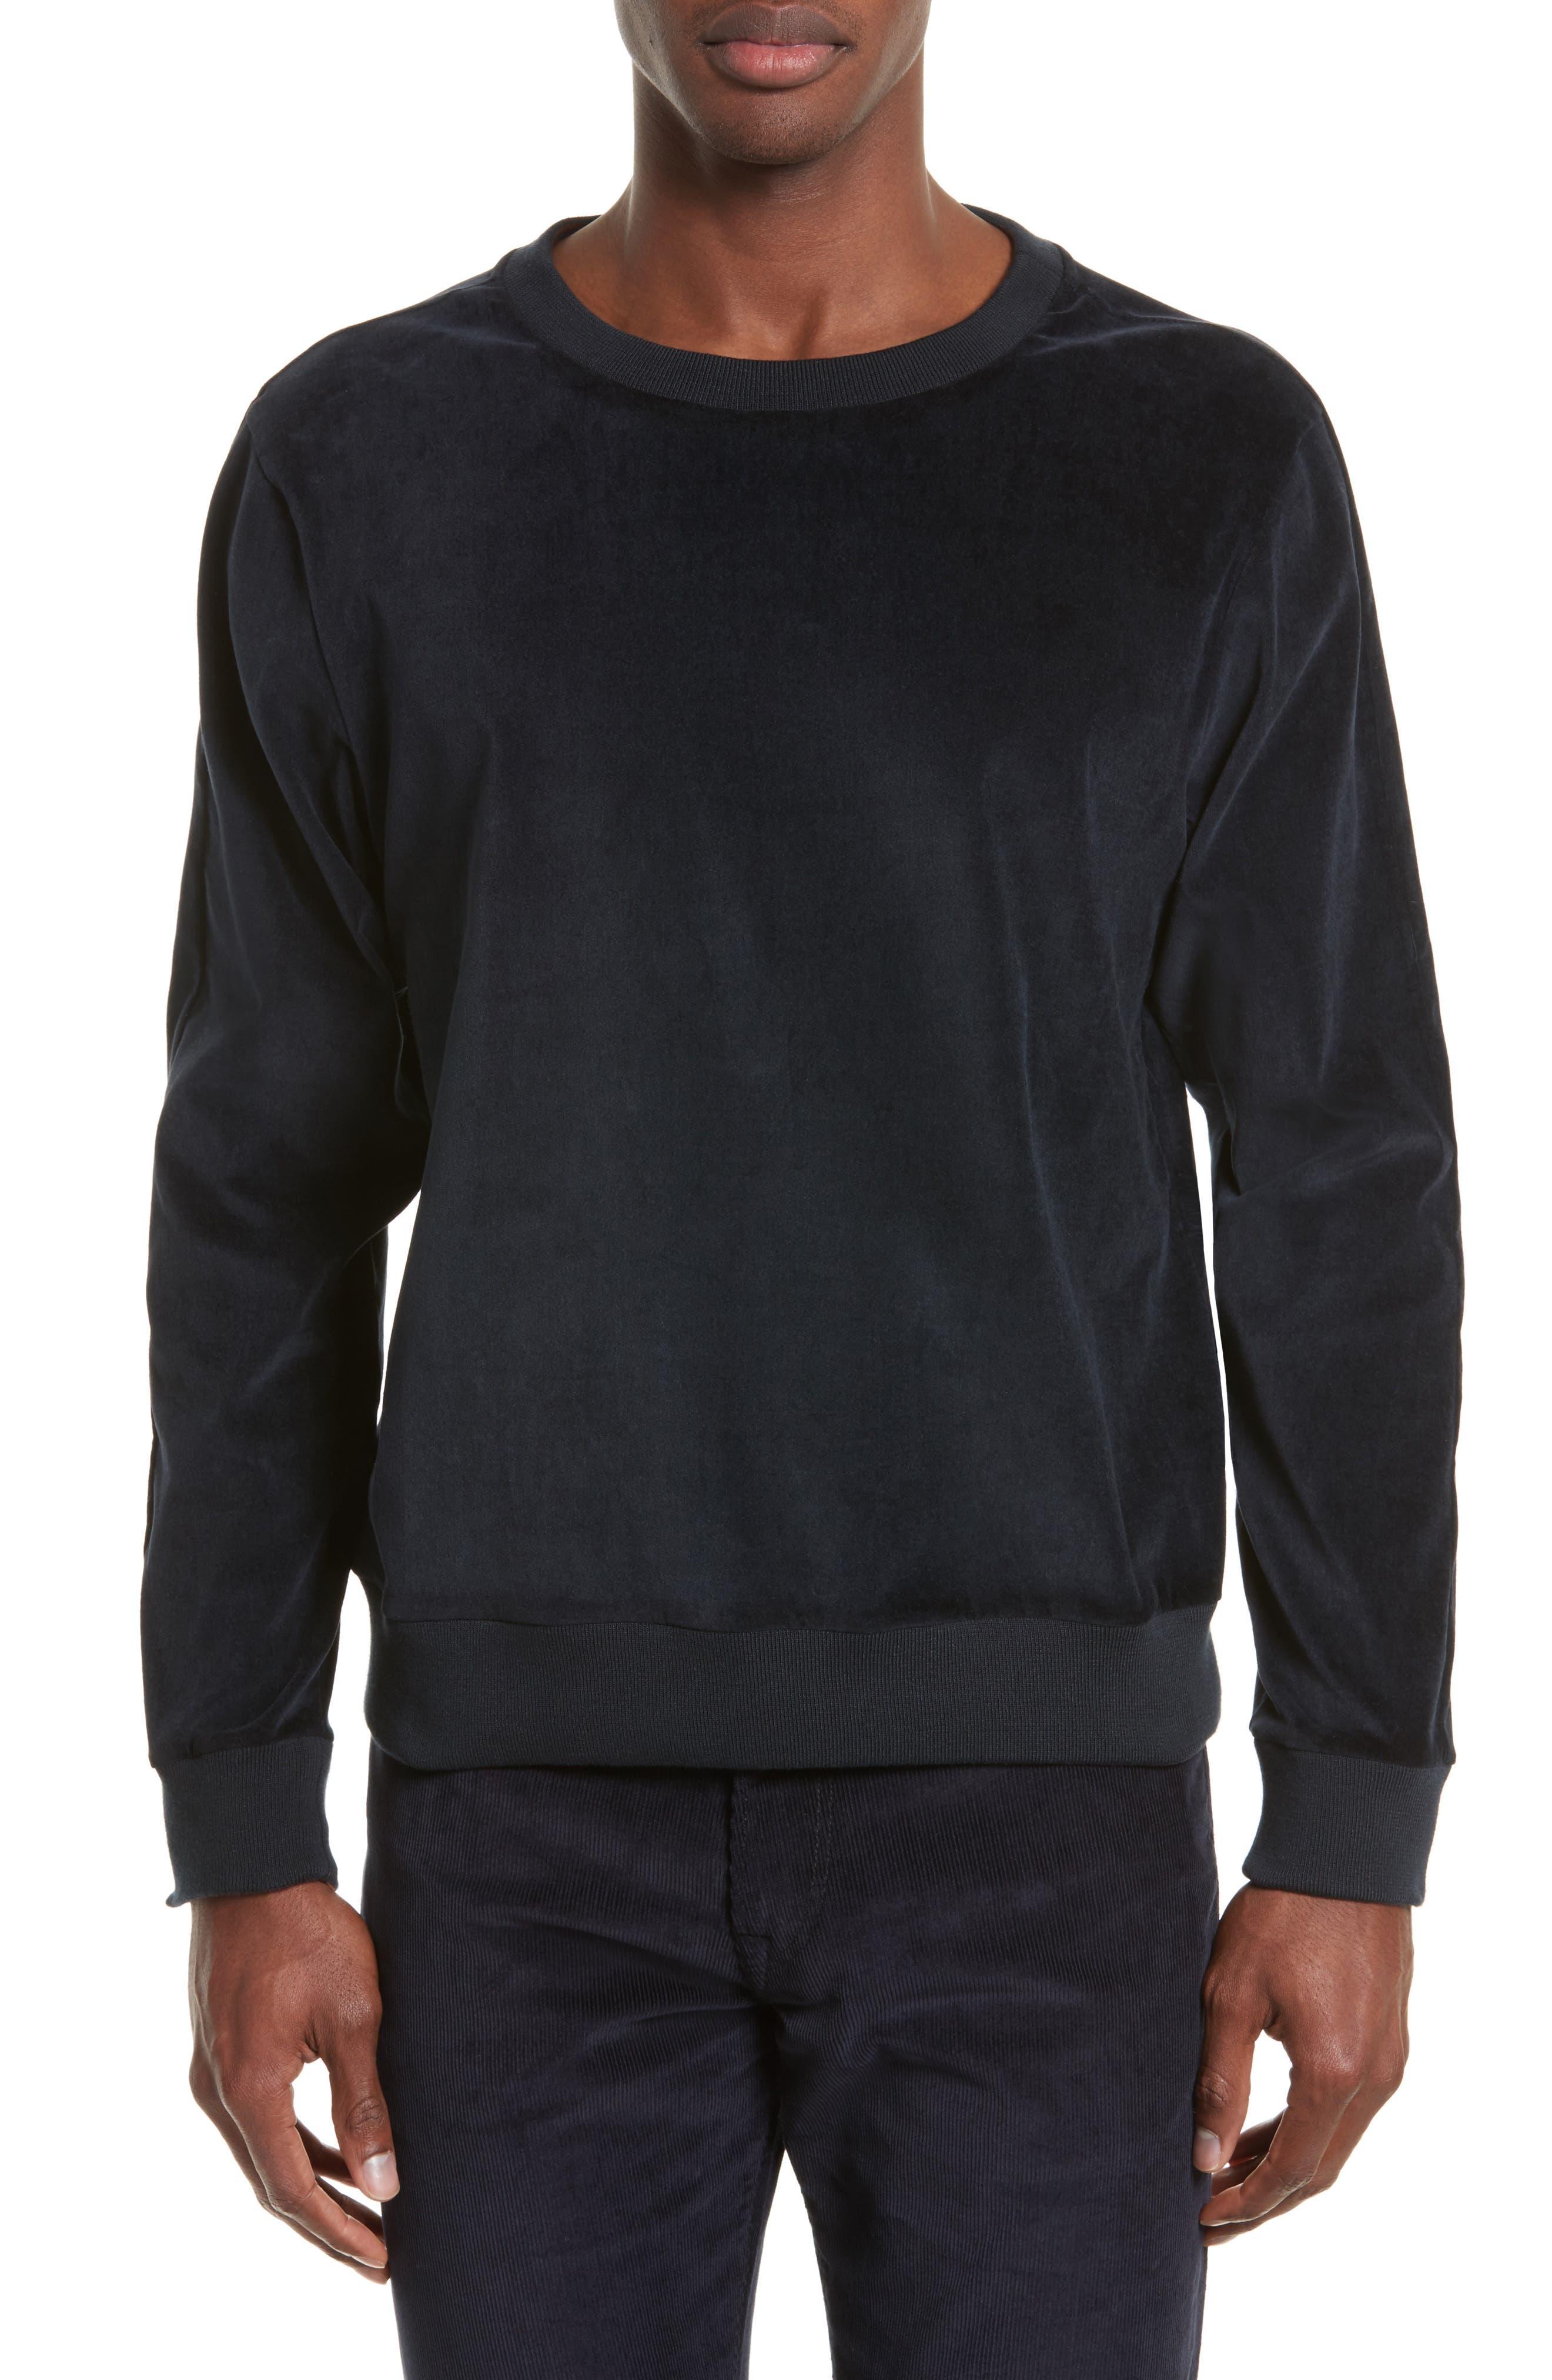 Alternate Image 1 Selected - Paul Smith Velvet Sweatshirt